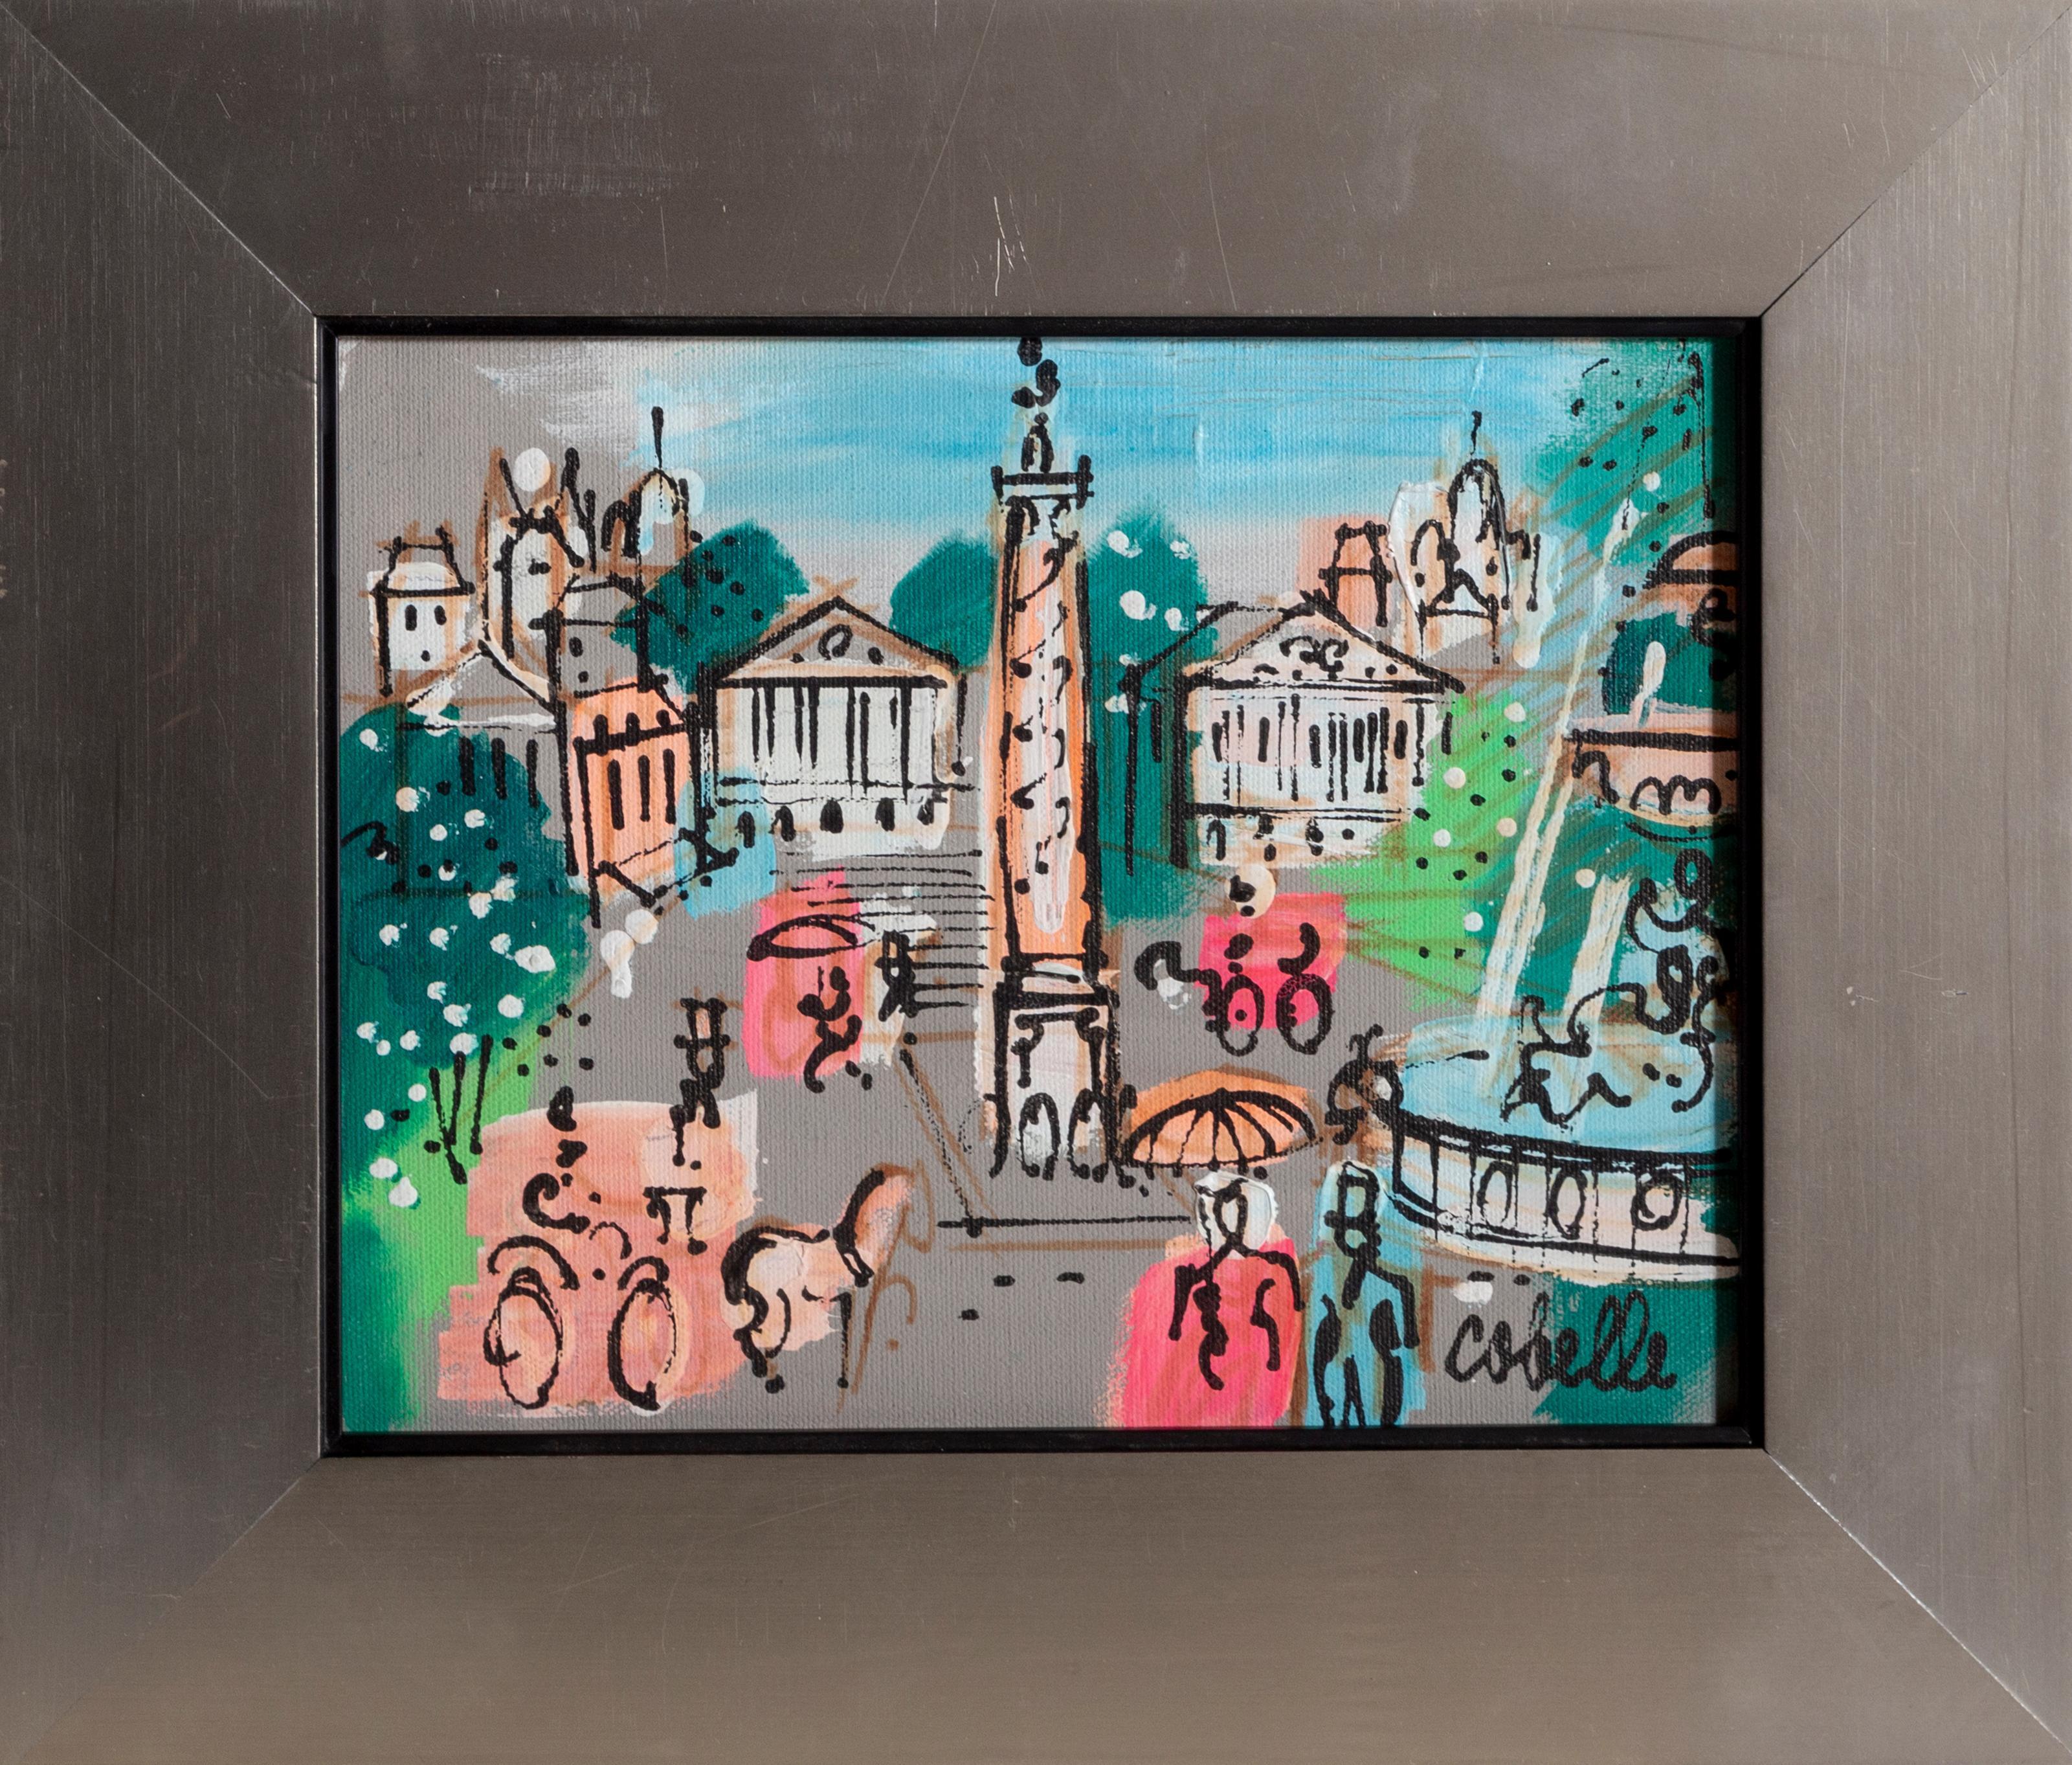 Place Vendôme with Fountain, Paris Cityscape Painting by Charles Cobelle